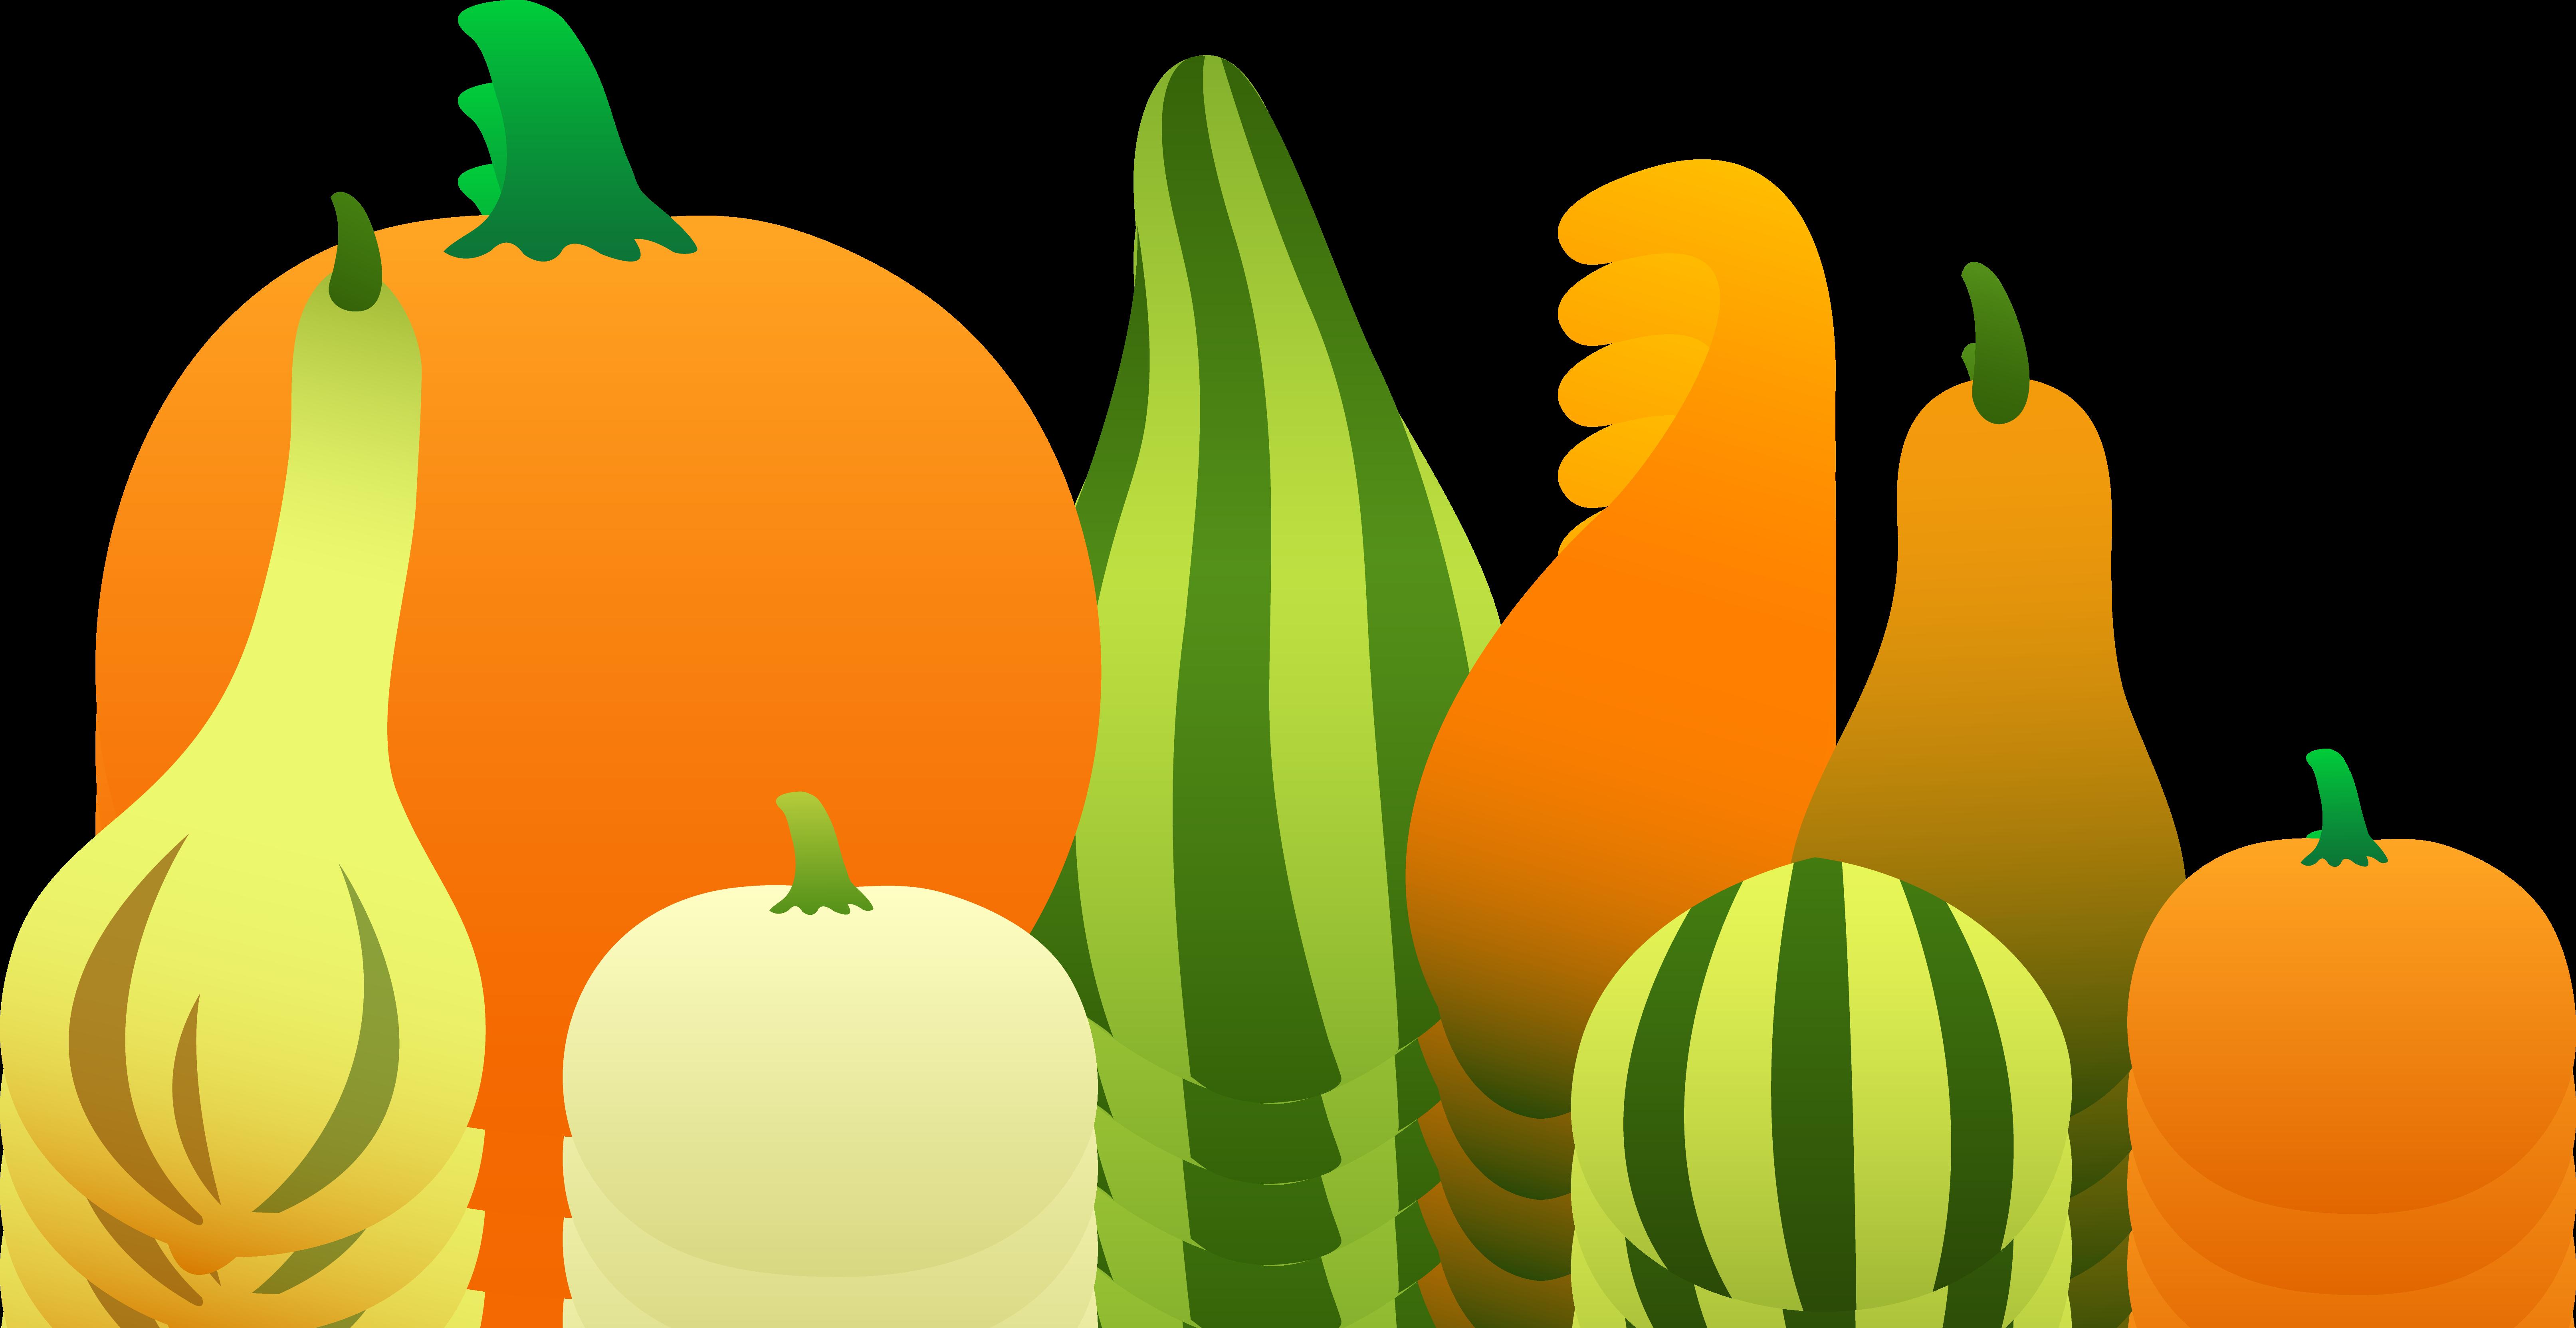 6452x3326 Thanksgiving Pumpkin Border Clipart